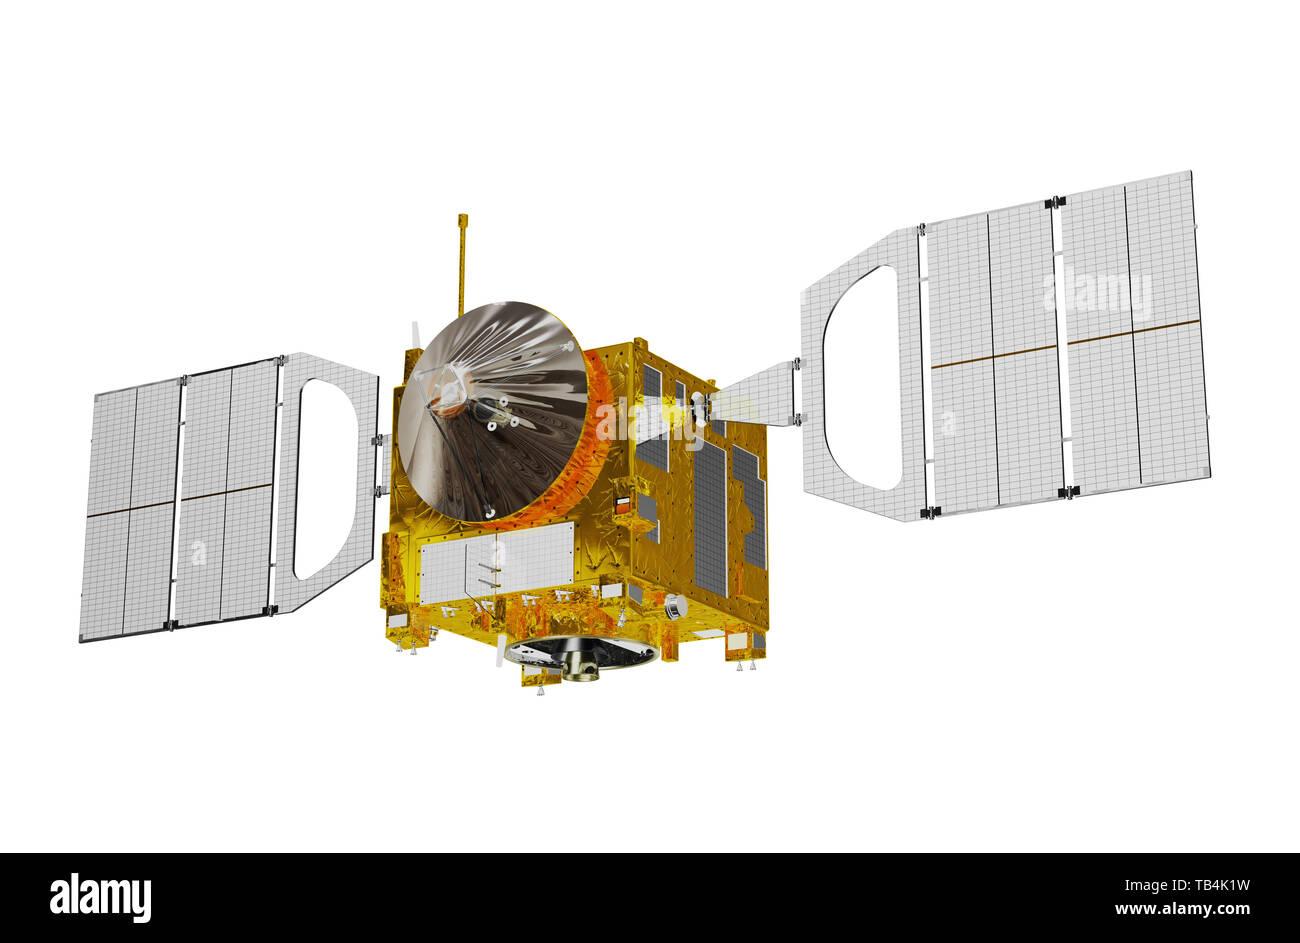 Interplanetary Space Station Isolated On White Background. 3D Illustration. - Stock Image